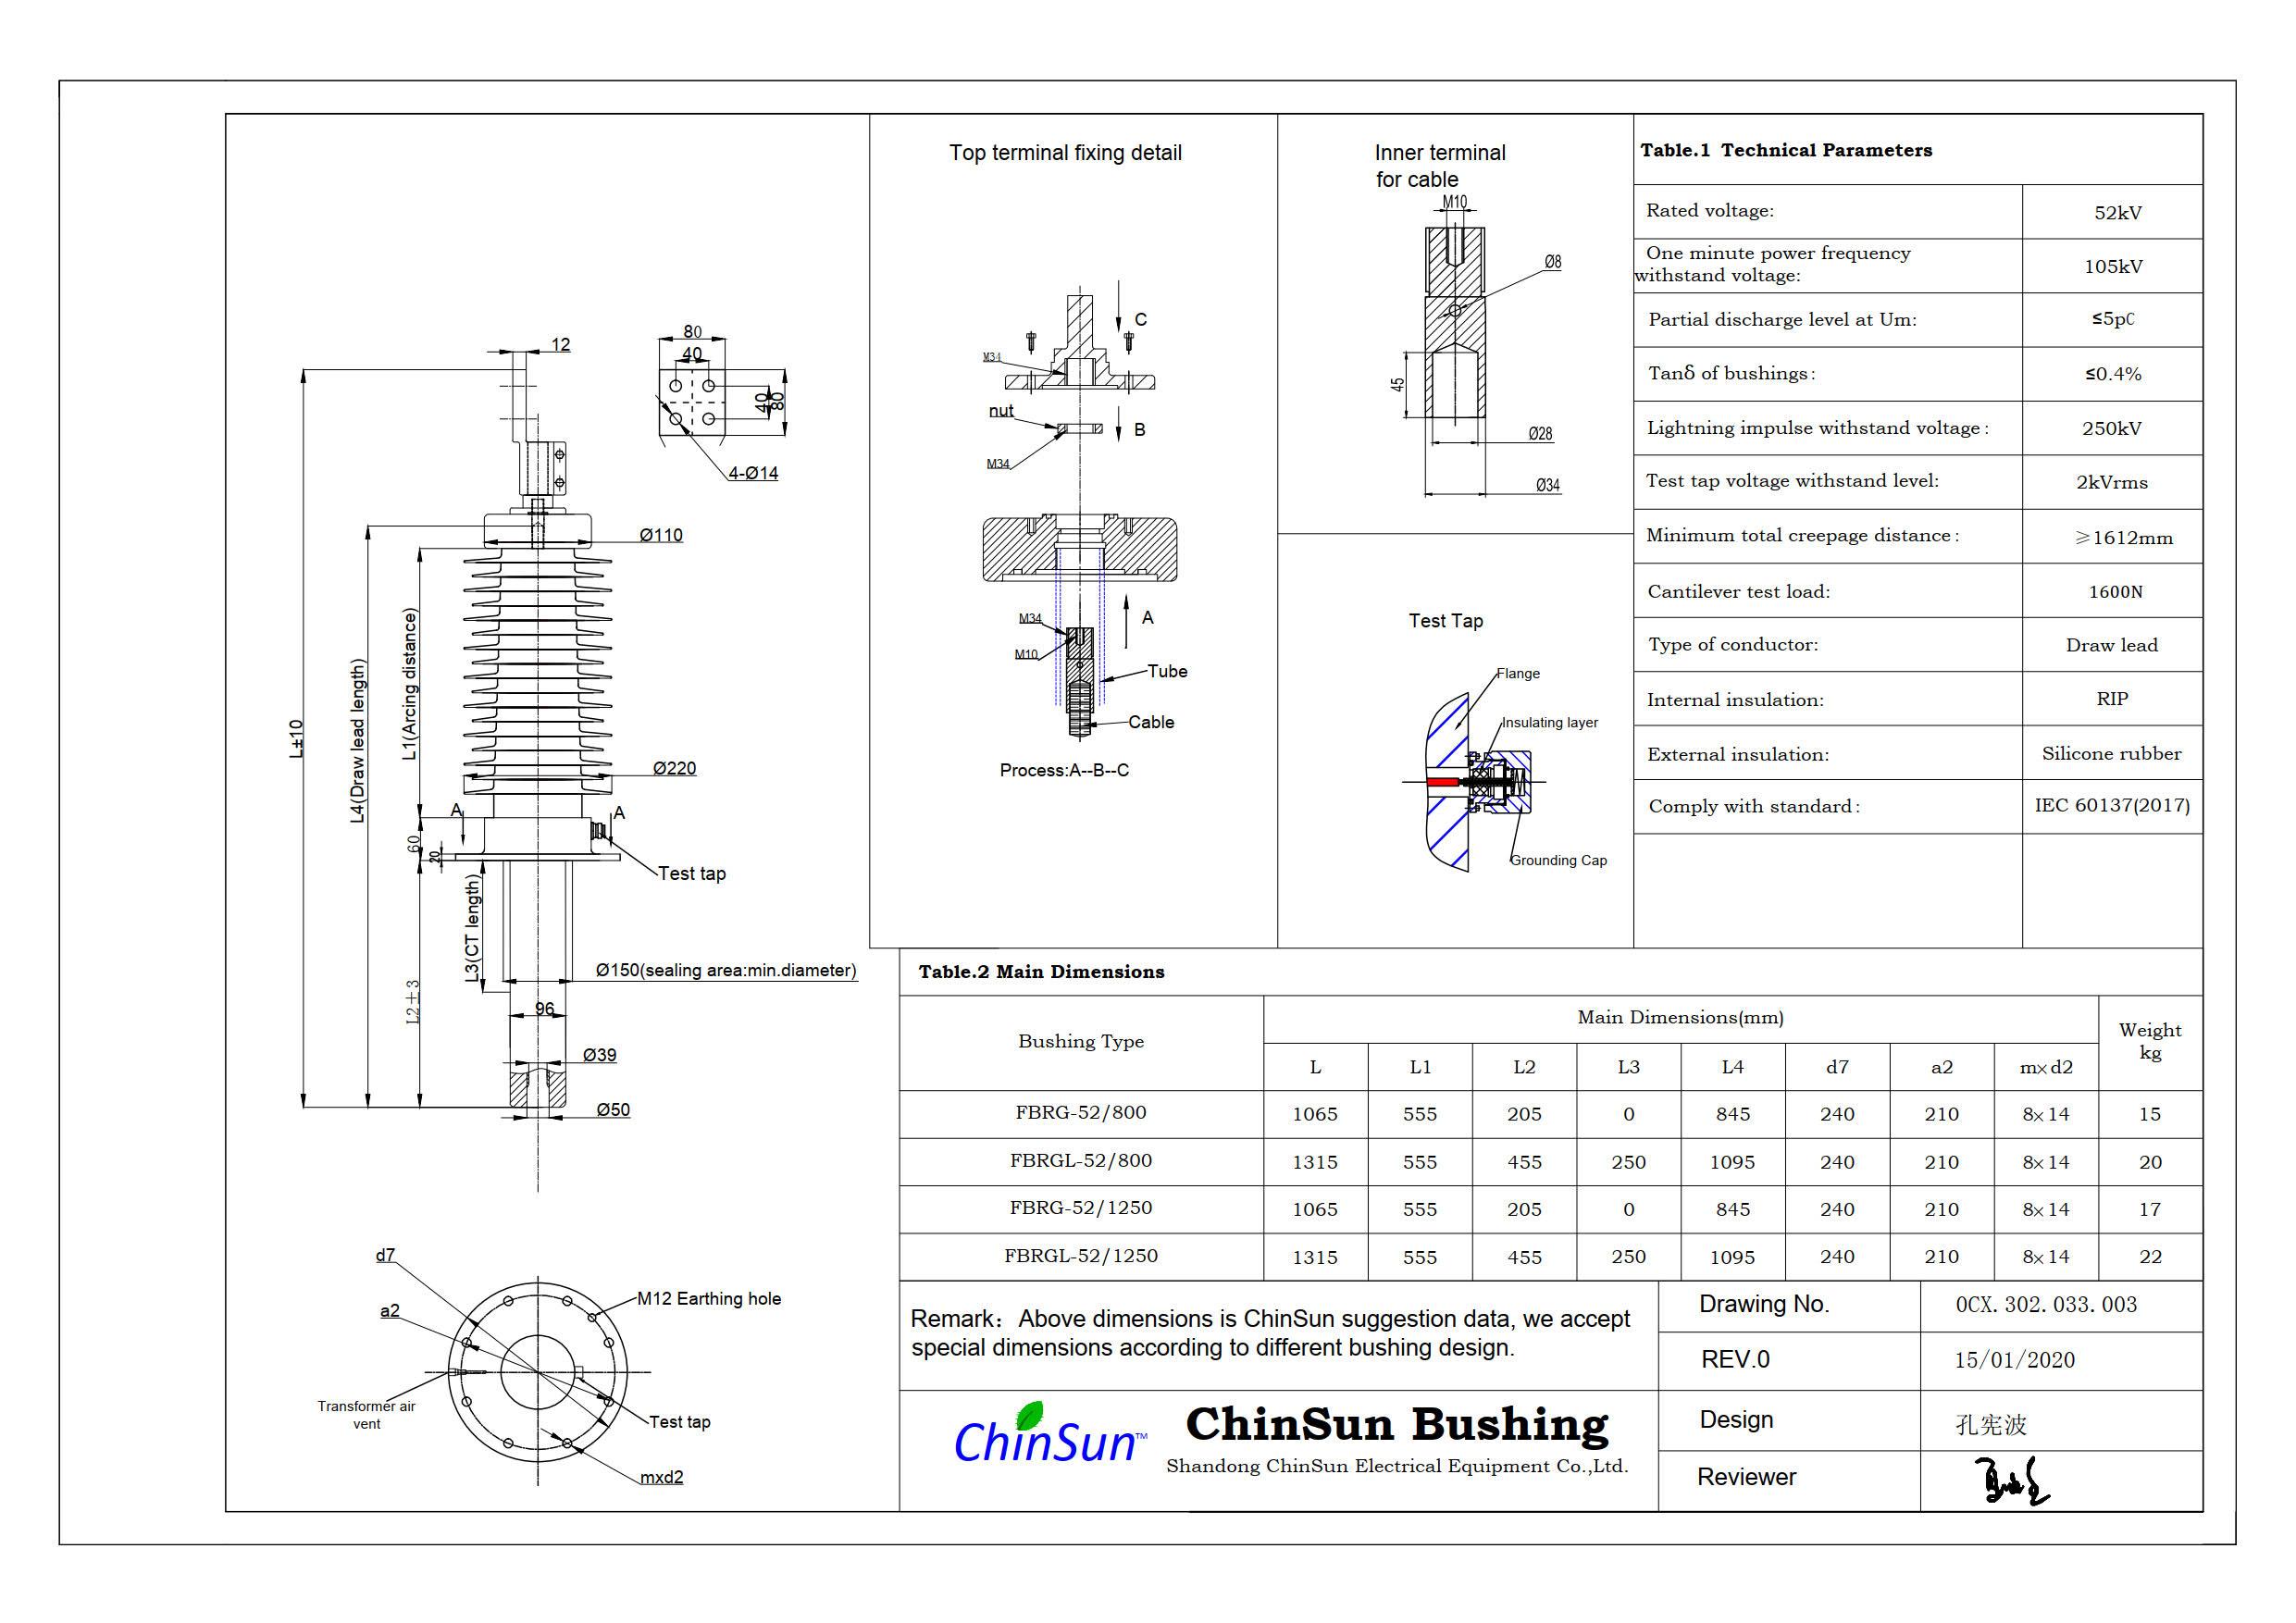 Drawing-transformer bushing-52kV_silicone rubber-DL-ChinSun